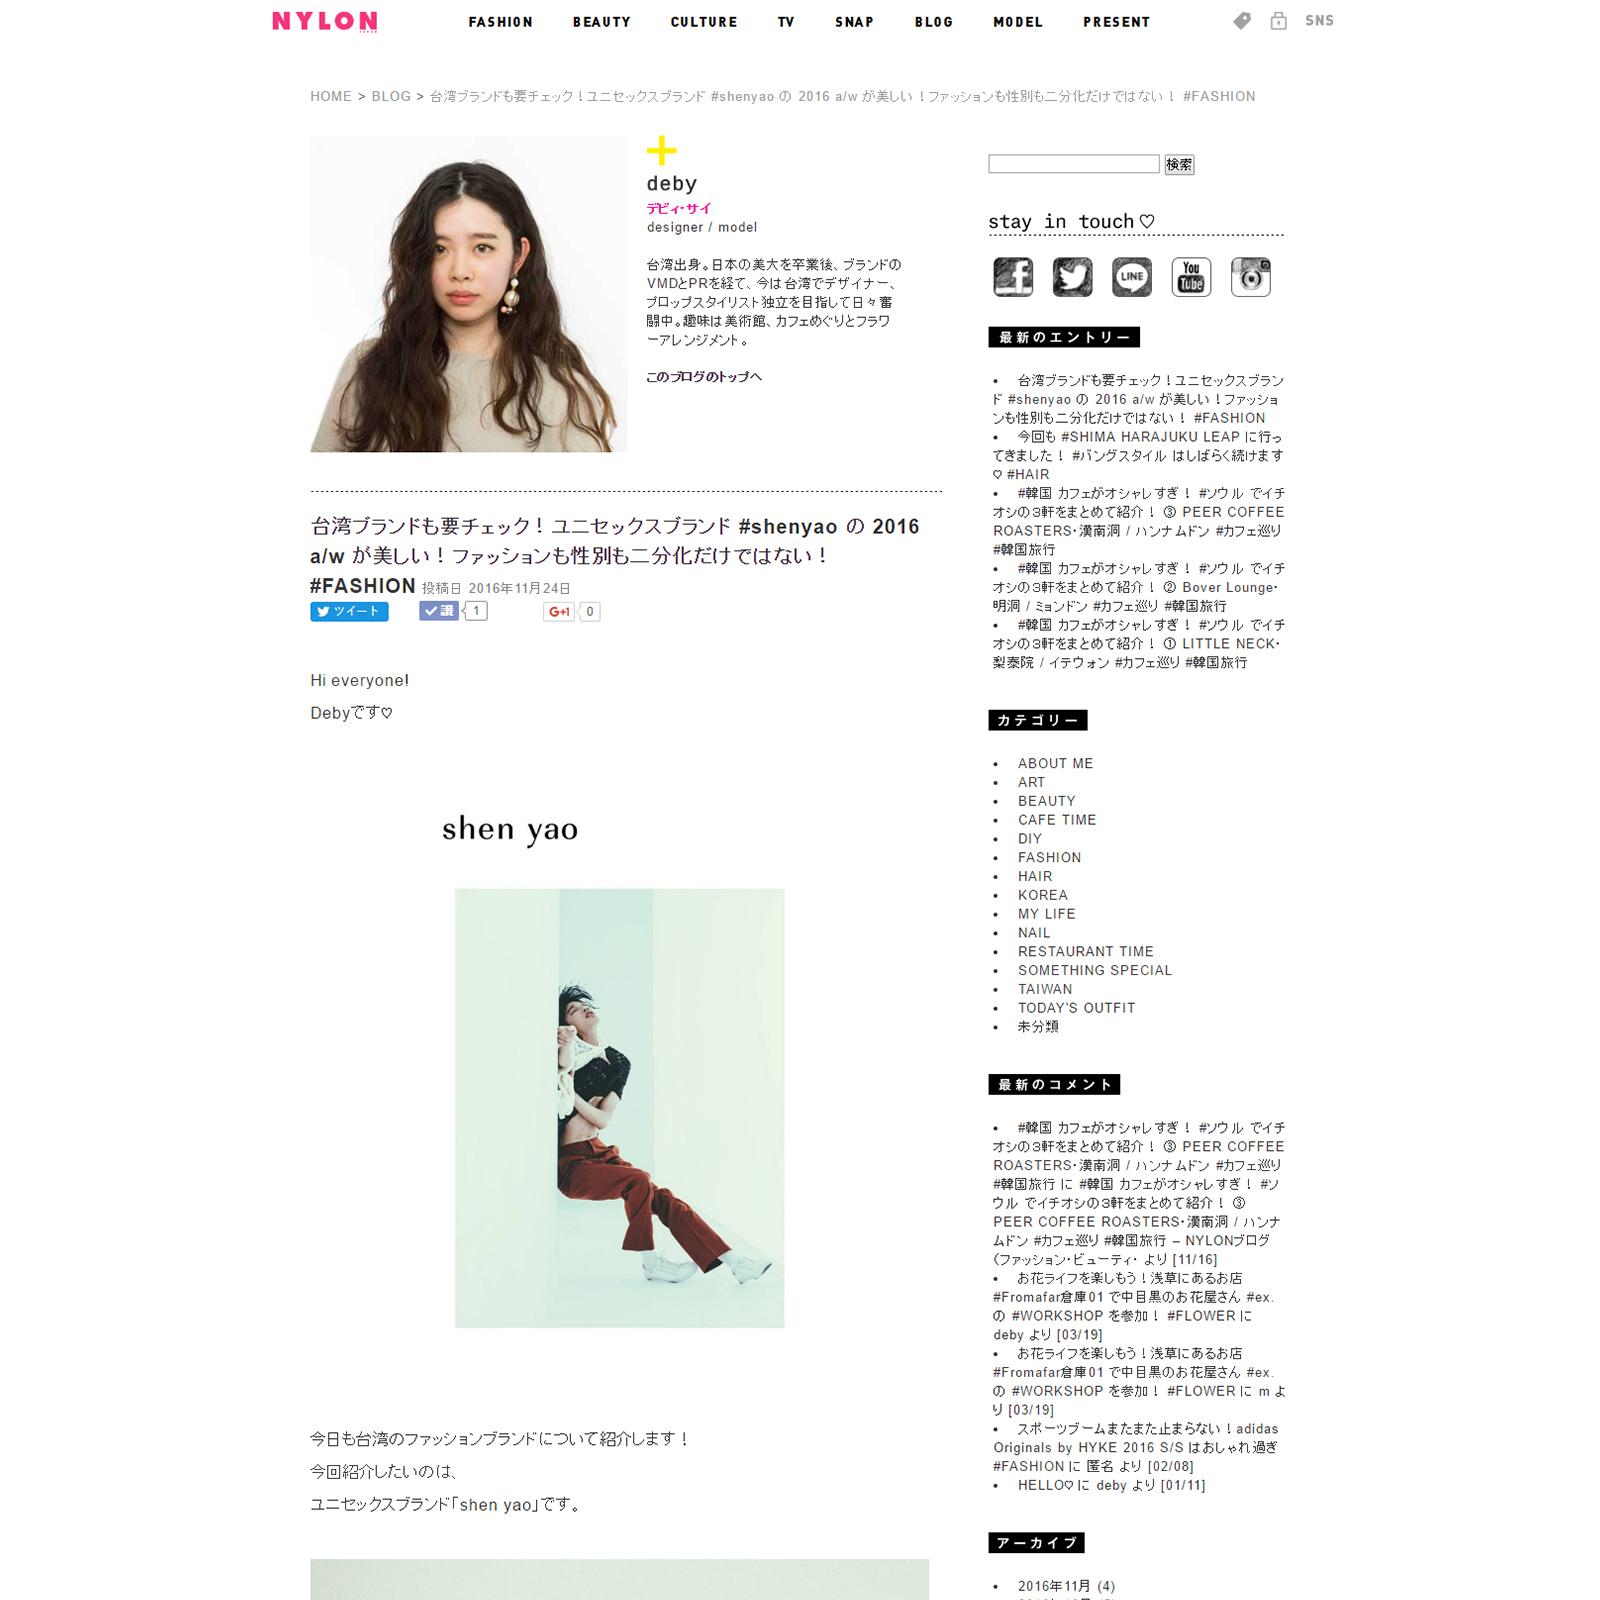 NYLON Japan Blogger Featured